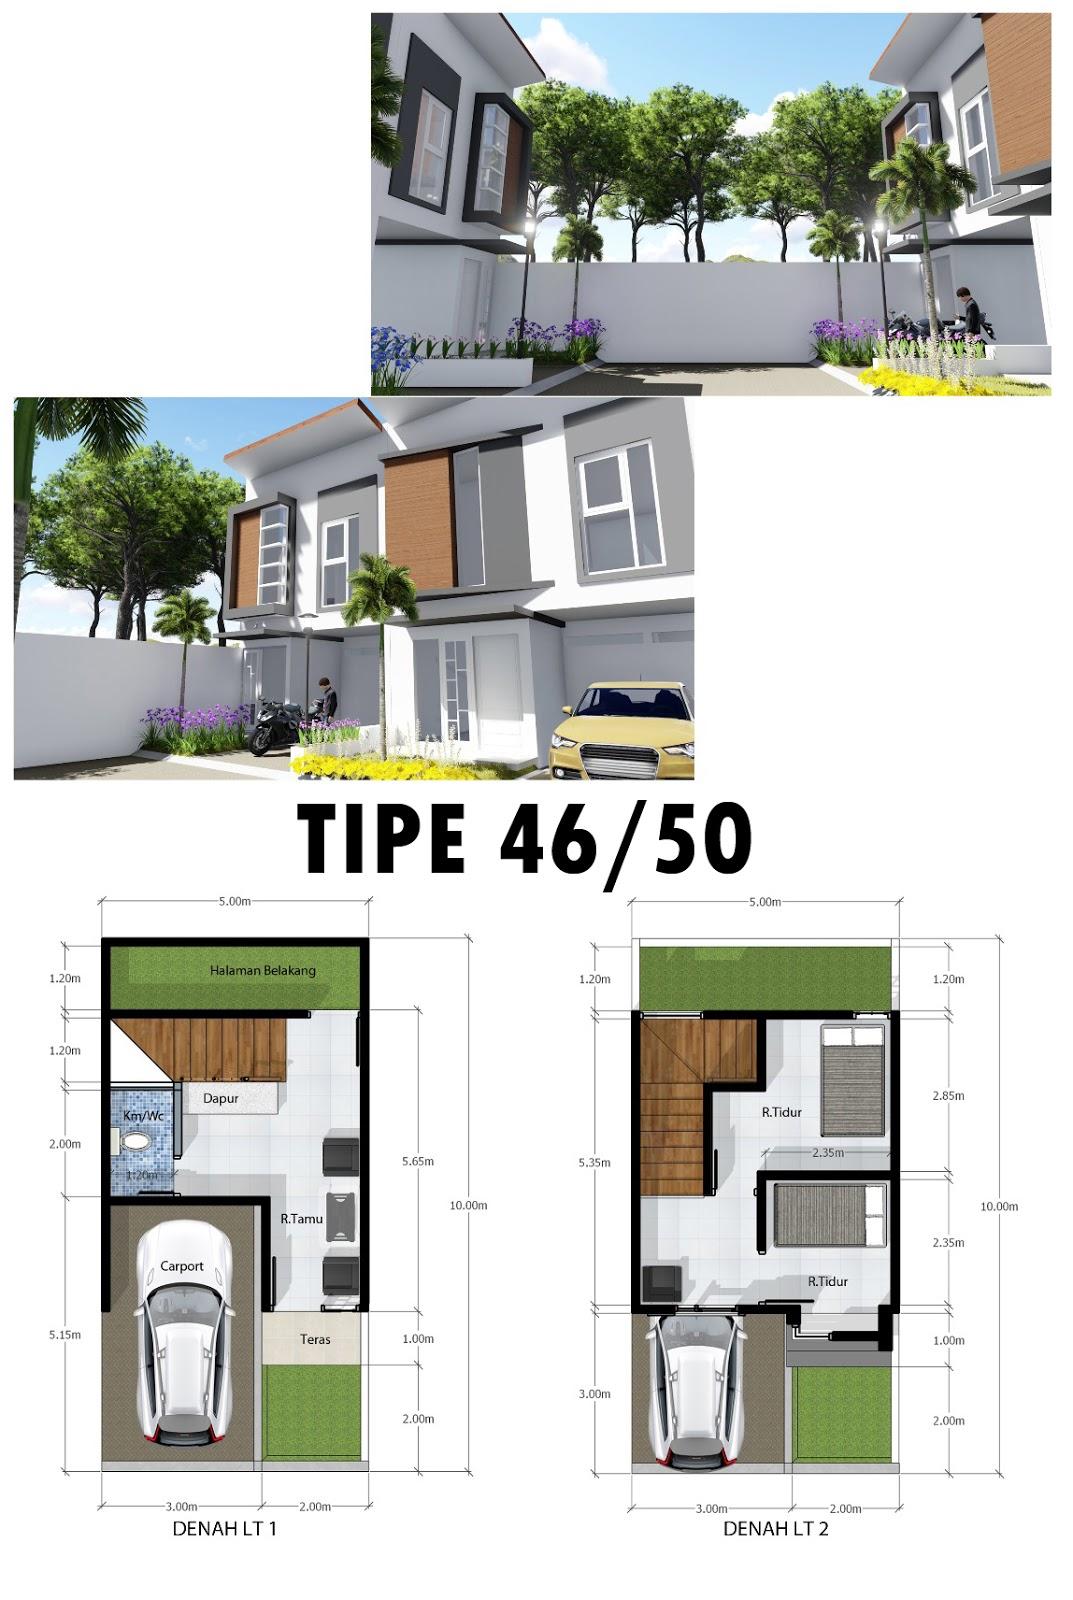 ini adalah gambar denah serta desain 3D rumah villa di Cluster Jade - Exotic Panderman Hill yang terletak di Batu Malang dekat Jatim Park dan BNS.